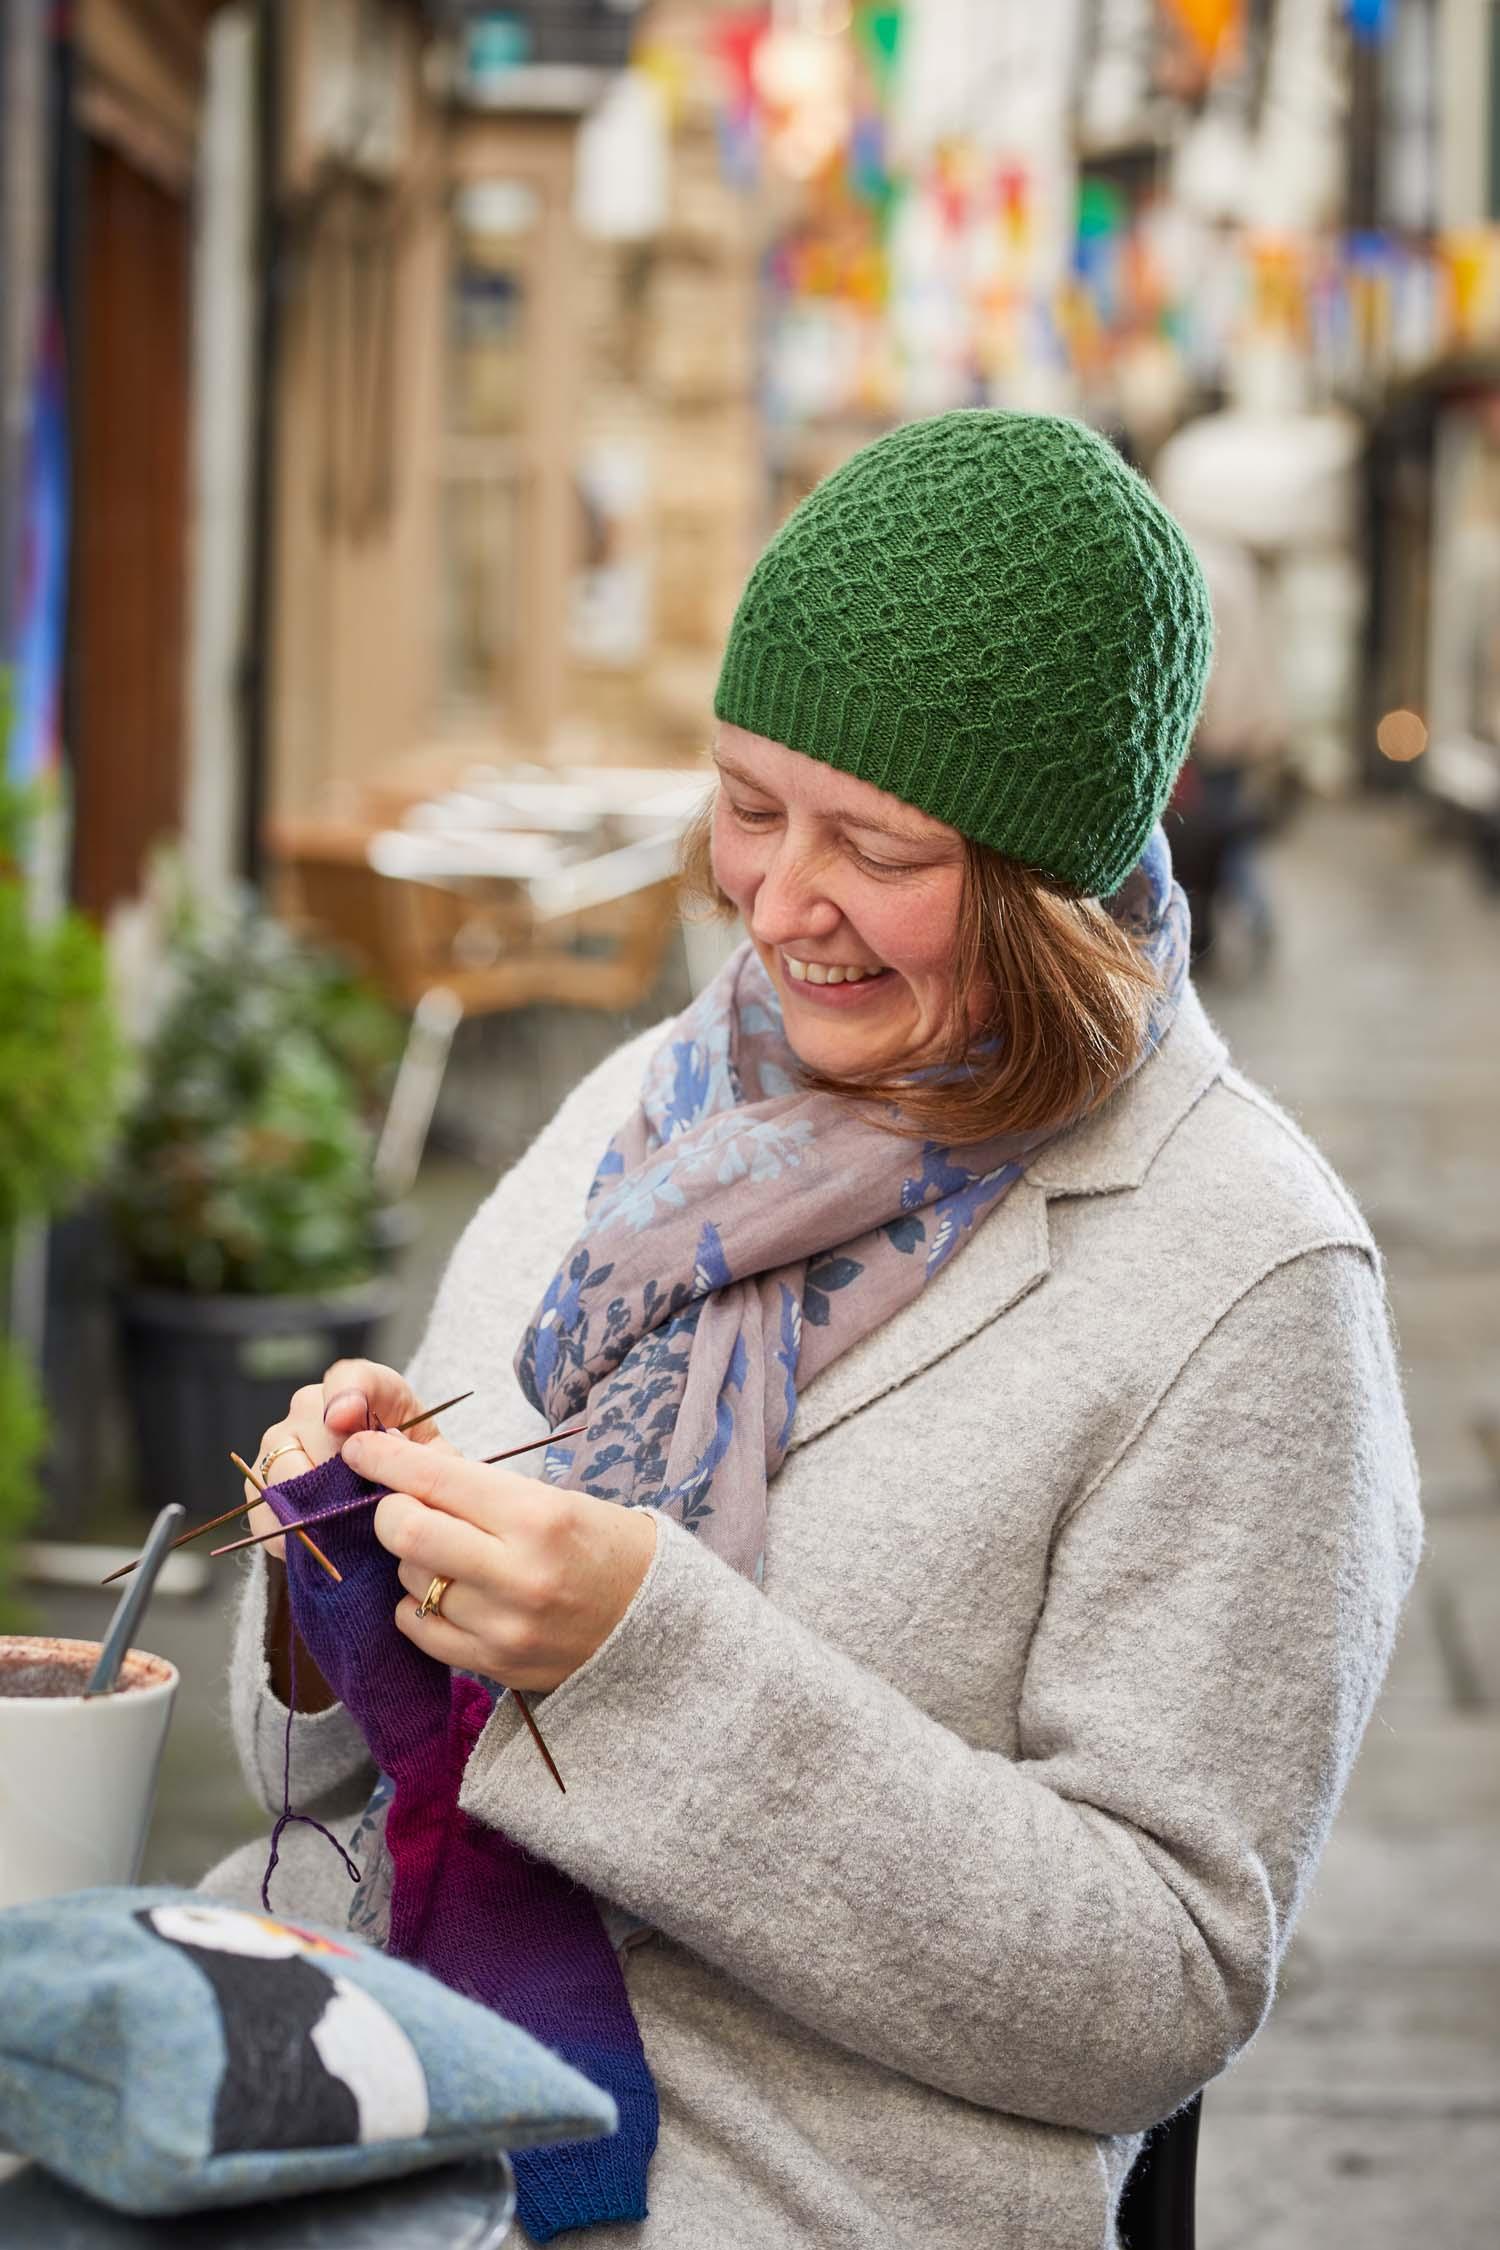 My Sumburgh Hat uses 2 balls of J&S Shetland Heritage. Image © Jesse Wild